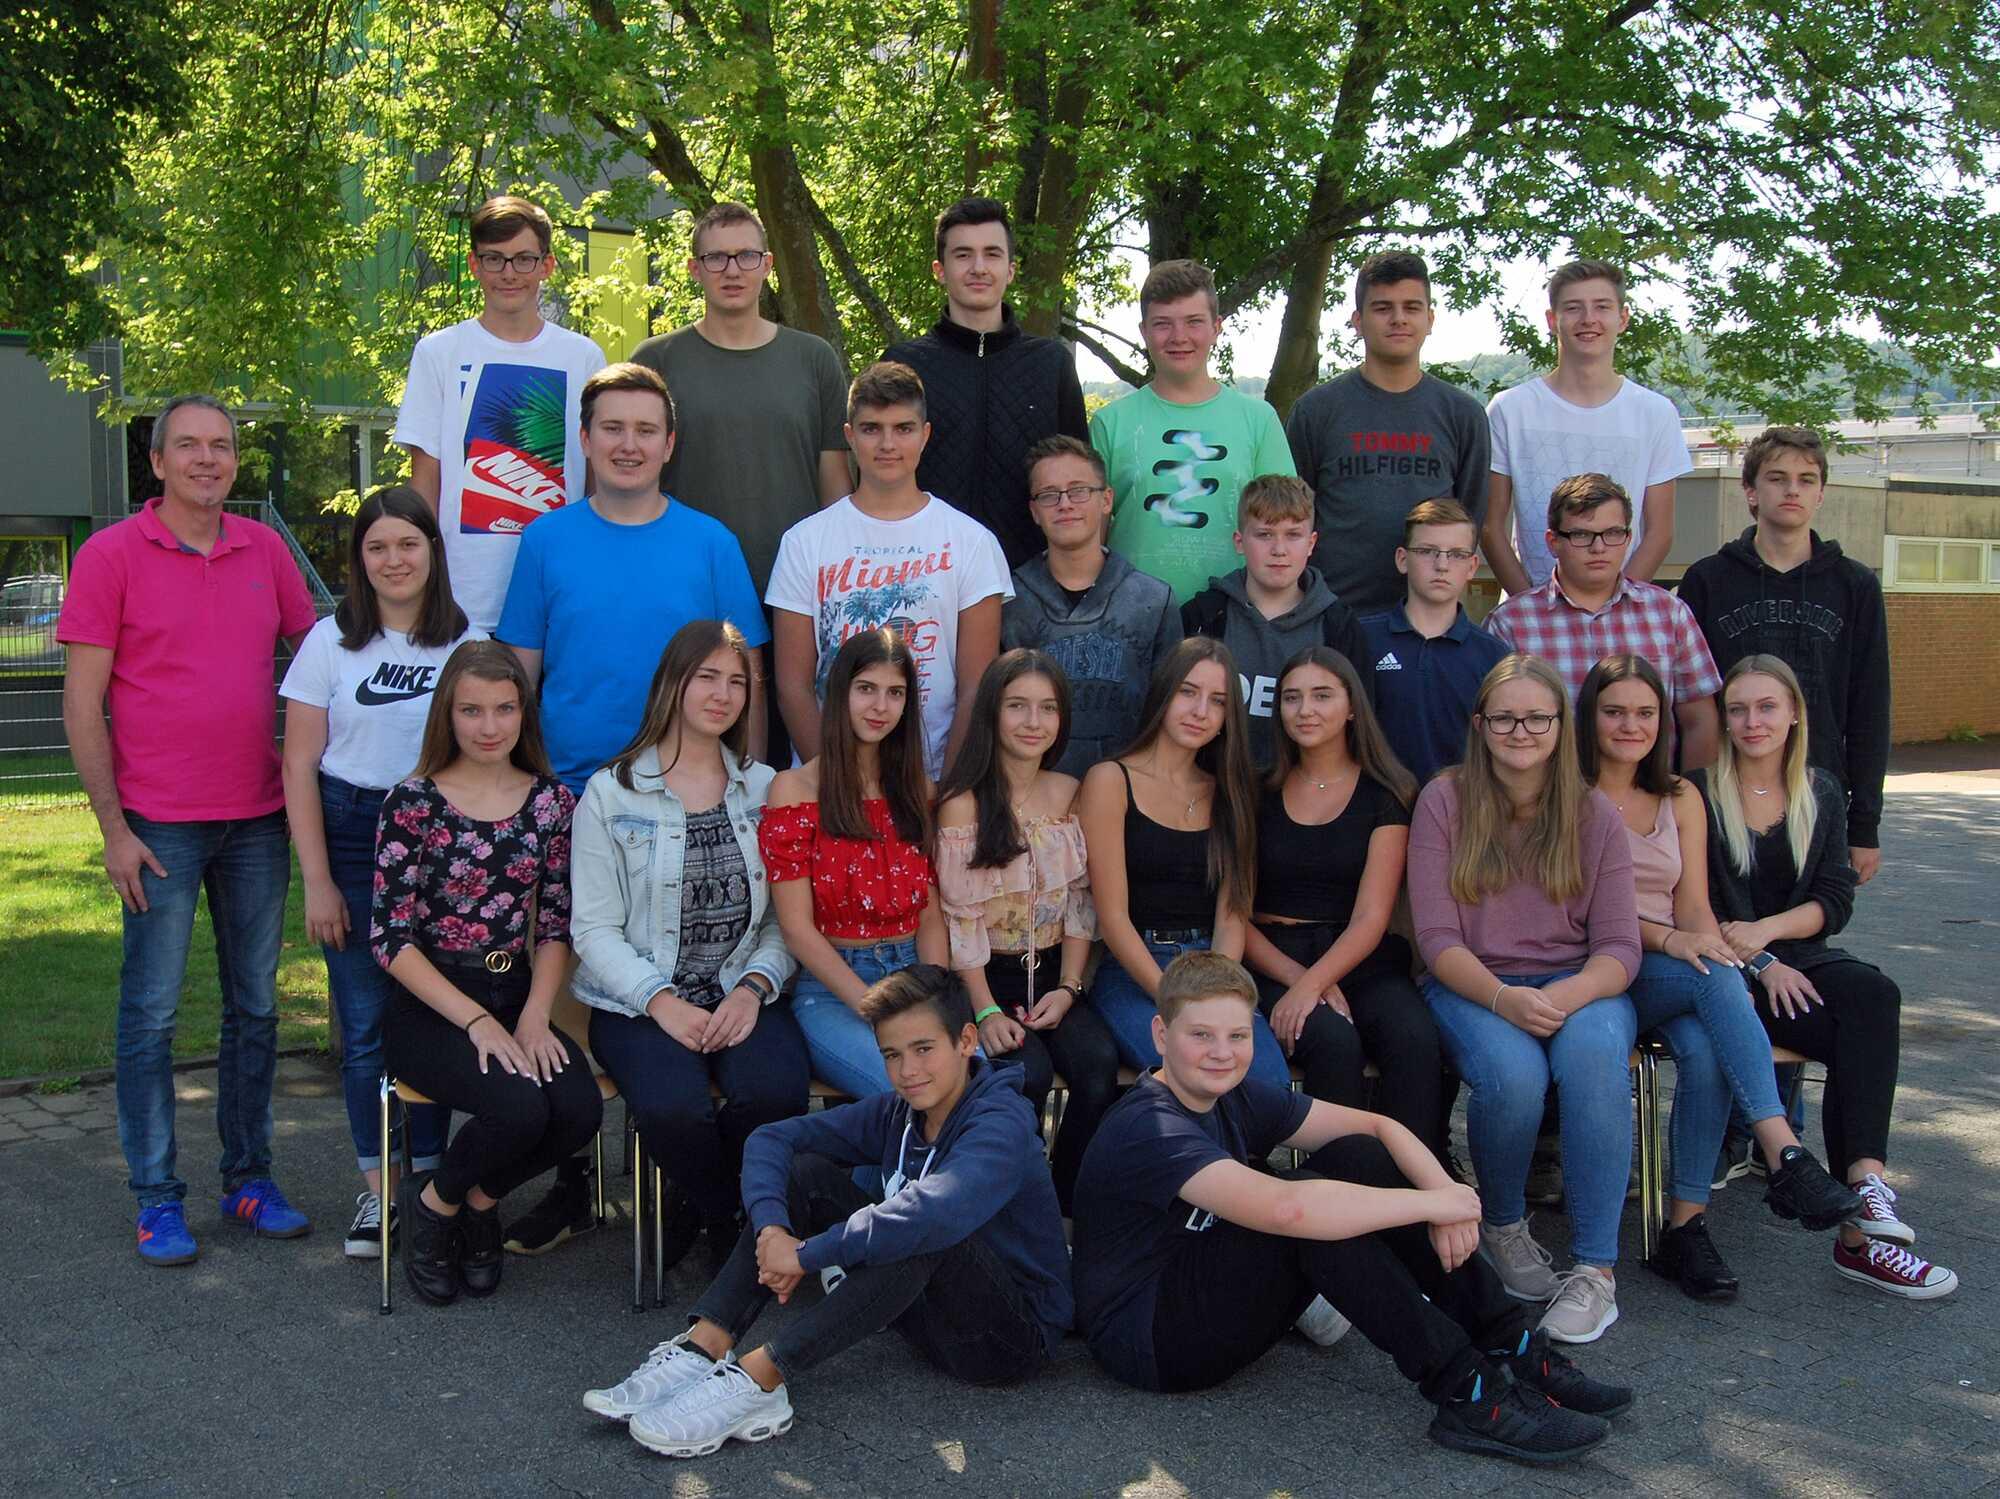 Klasse 10e - Herr Schulze/ Herr Schwarz